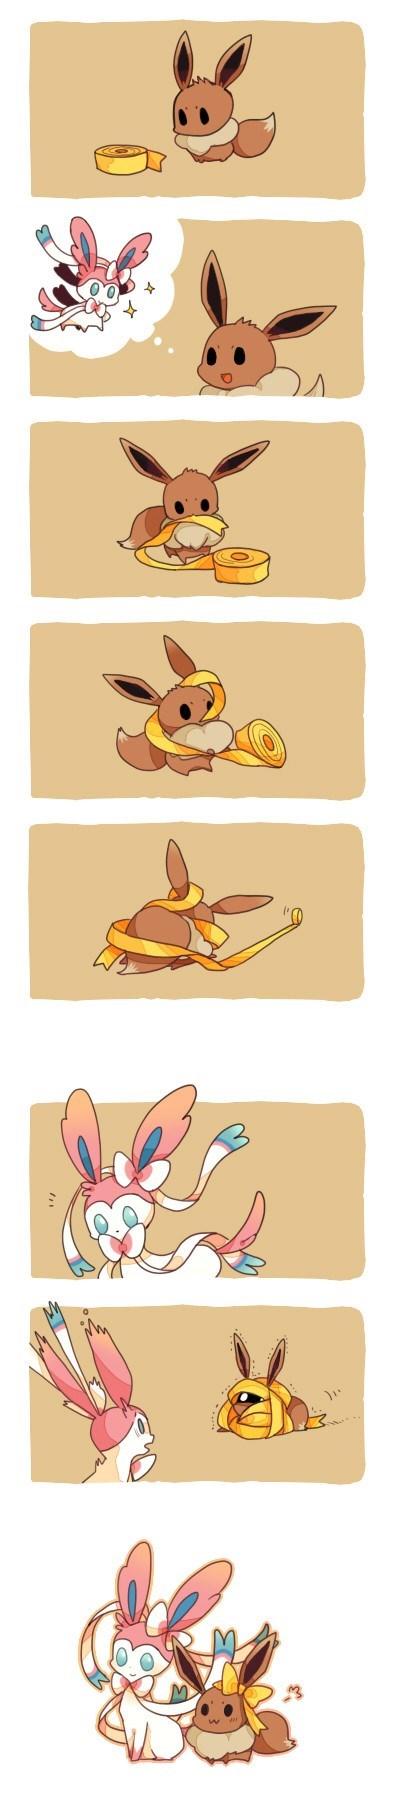 Pokémon,eevee